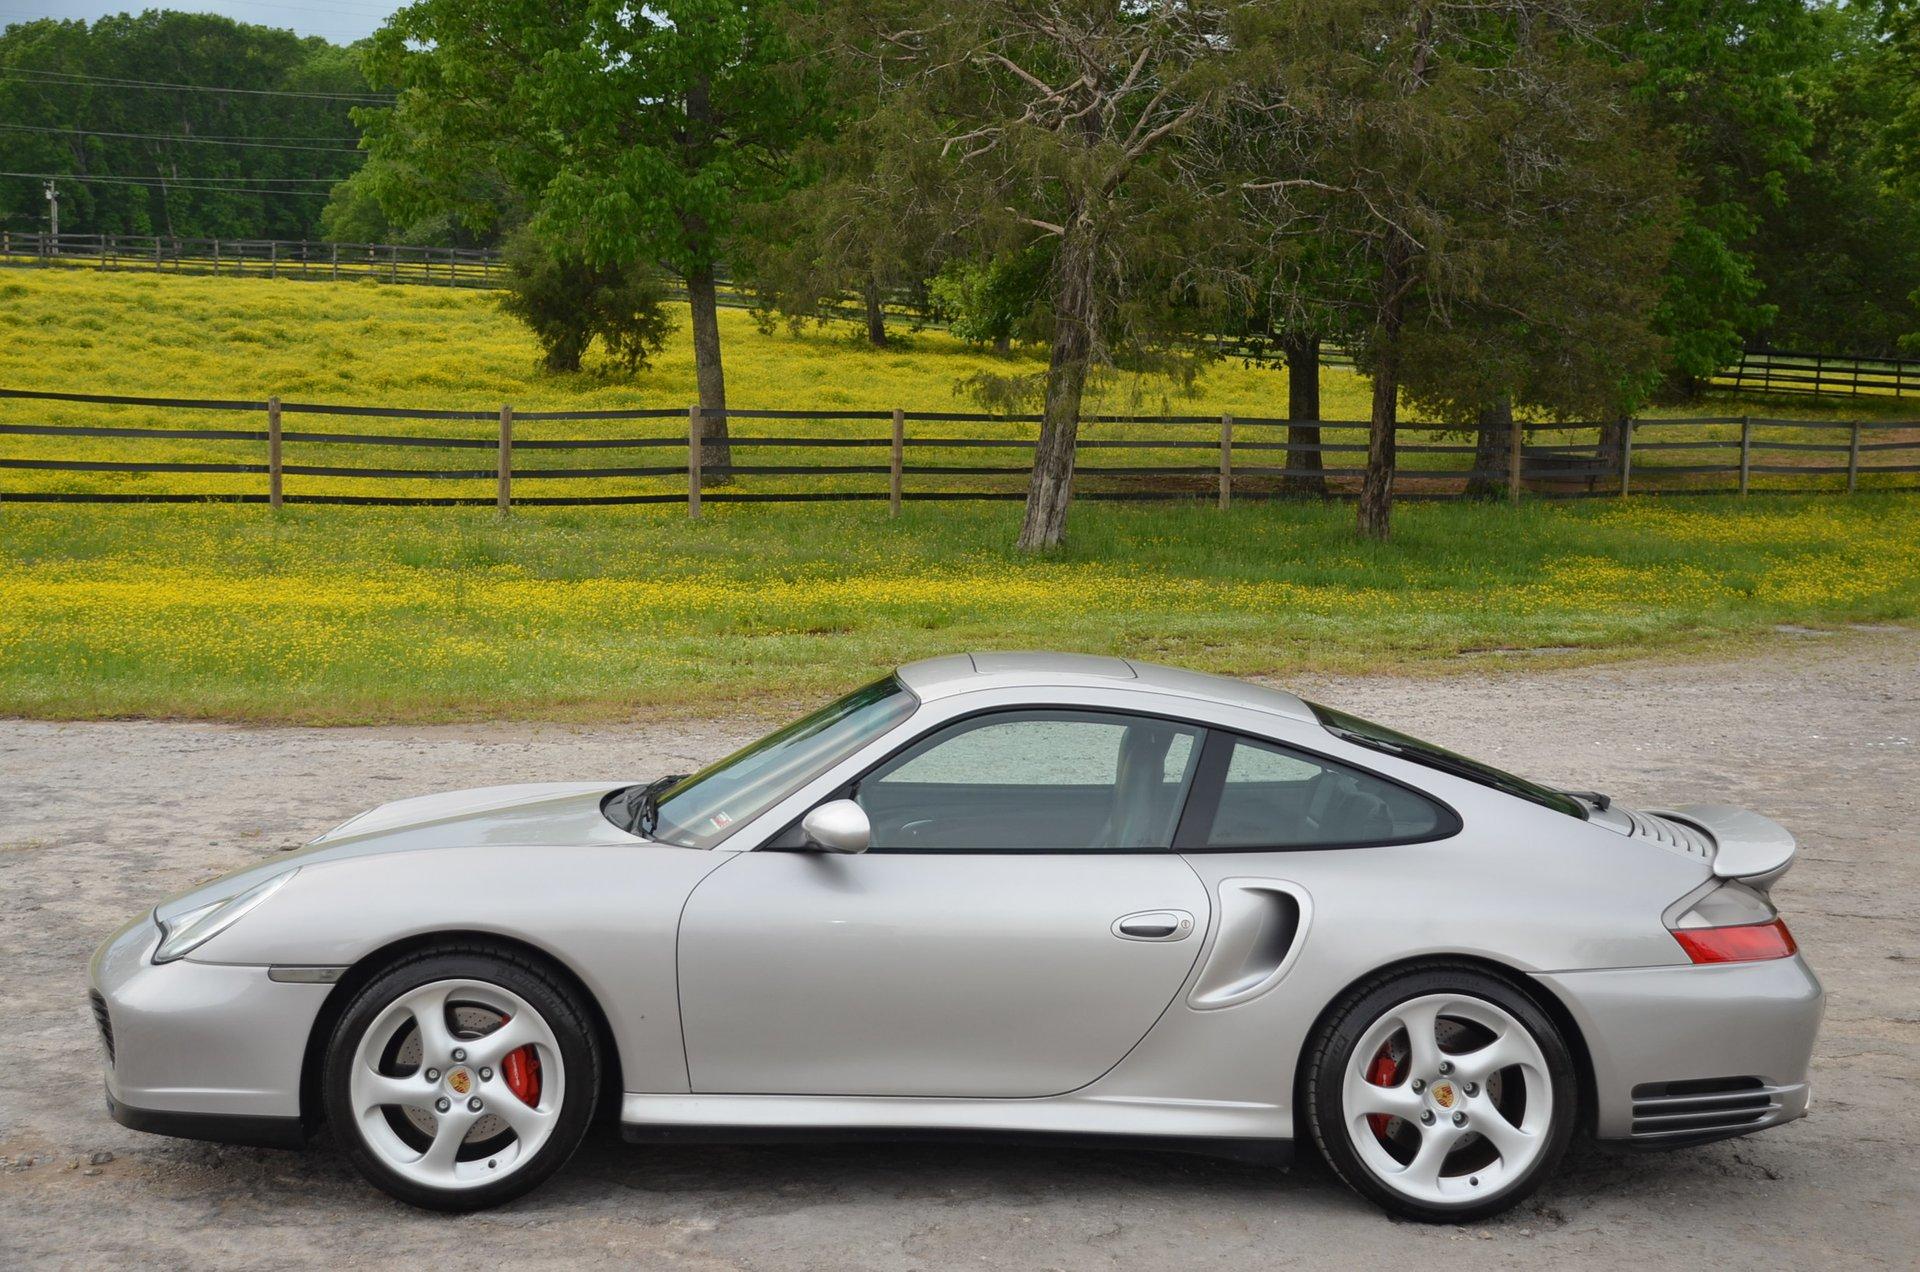 2002 Porsche 996 Turbo Frazier Motorcar Company